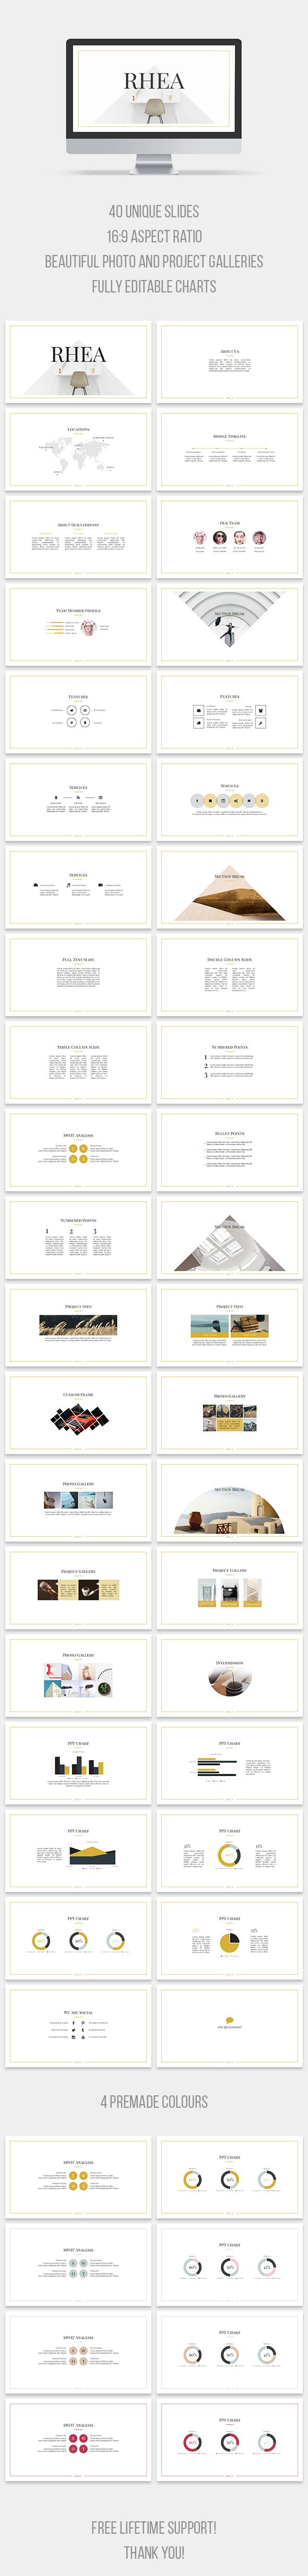 Rhea PowerPoint Template (PowerPoint Templates)